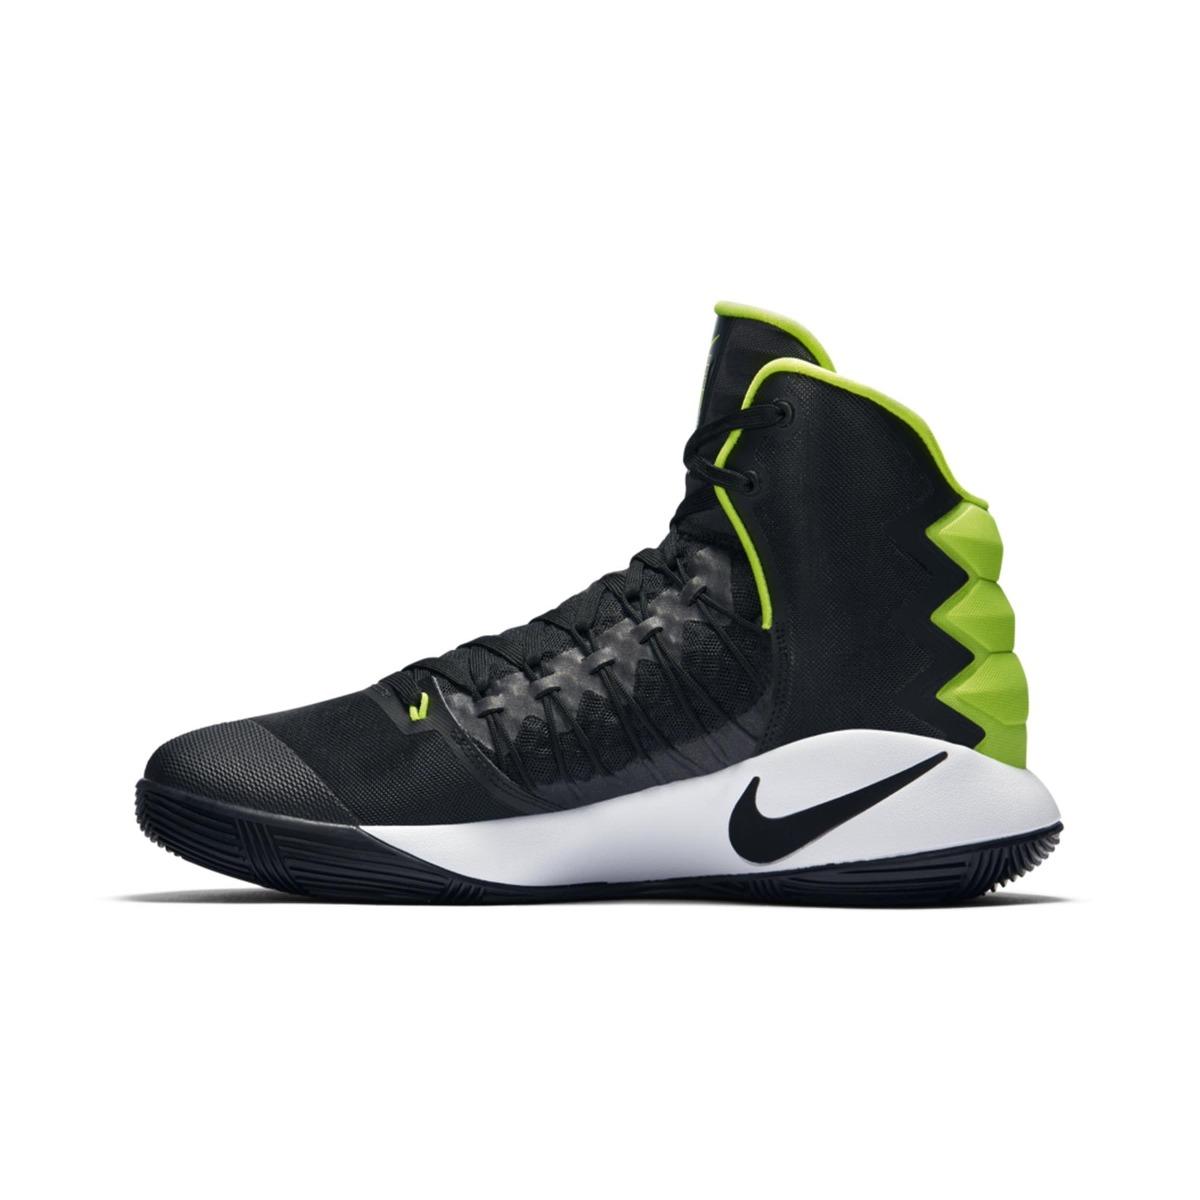 c7c0e3004 Tênis Nike Hyperdunk 2016 - Basquete - R  489